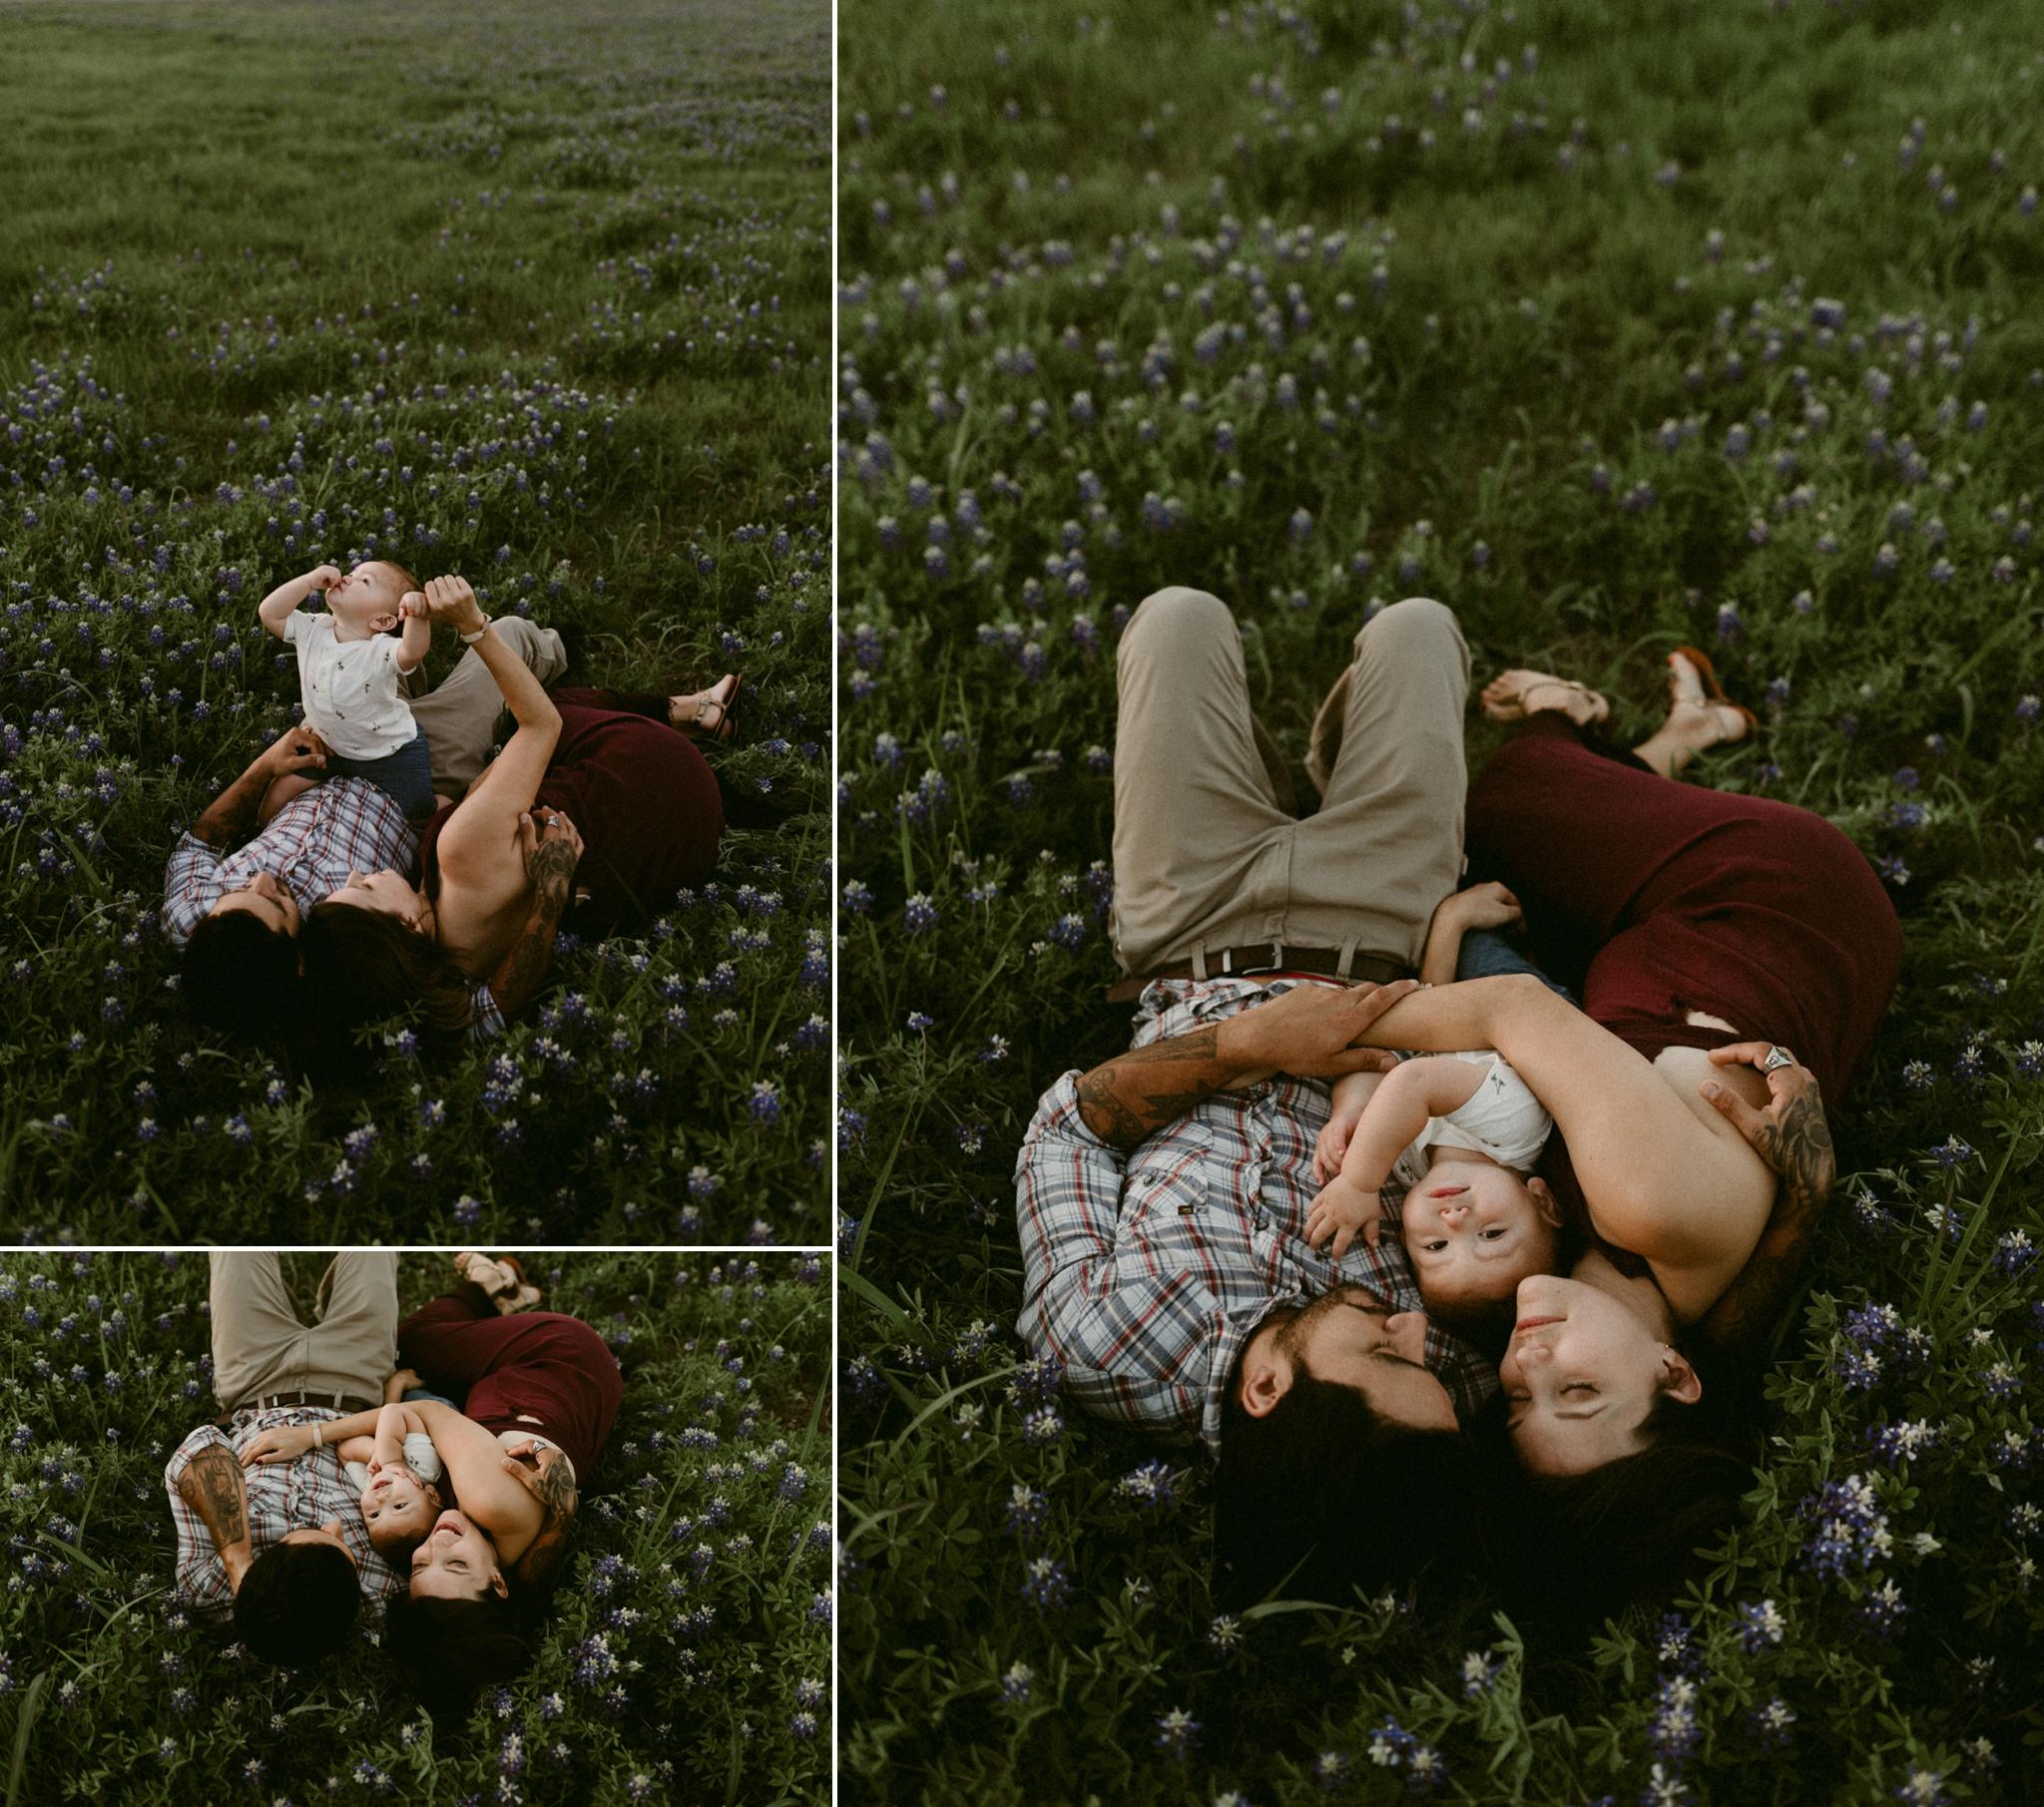 intimate-sunset-session-bluebonnets-wildflowers-mckinney-falls-austin-texas-kerlyn-van-gelder-photography-corpus-christi-photographer